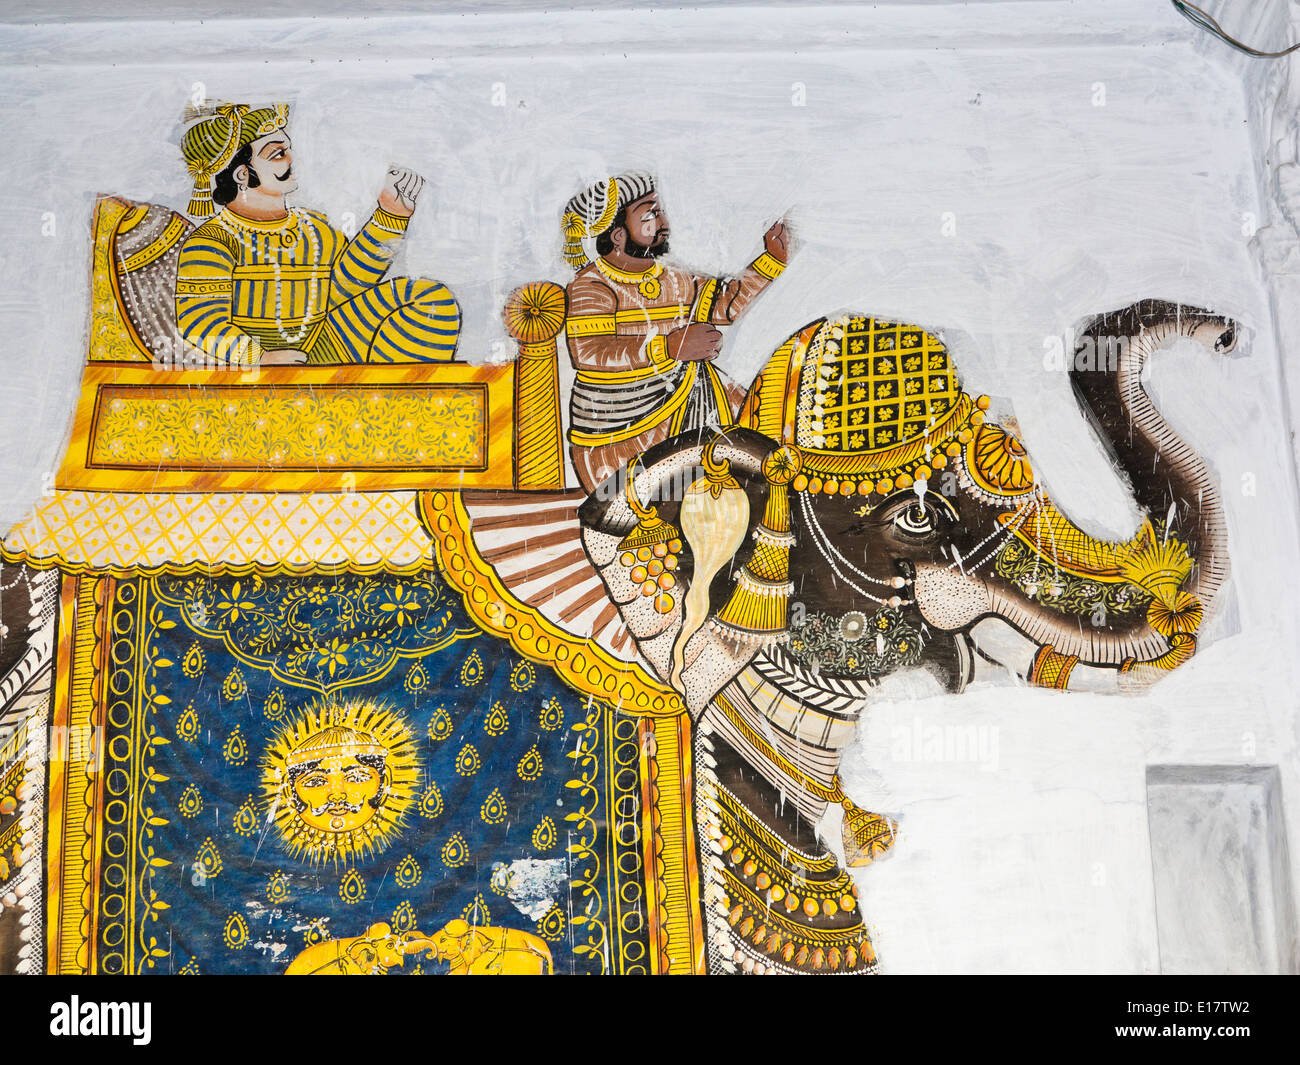 India Rajasthan, Udaipur, tradizionale pittura murale di Rajput uomini su caparisioned elefante simbolo surya Immagini Stock